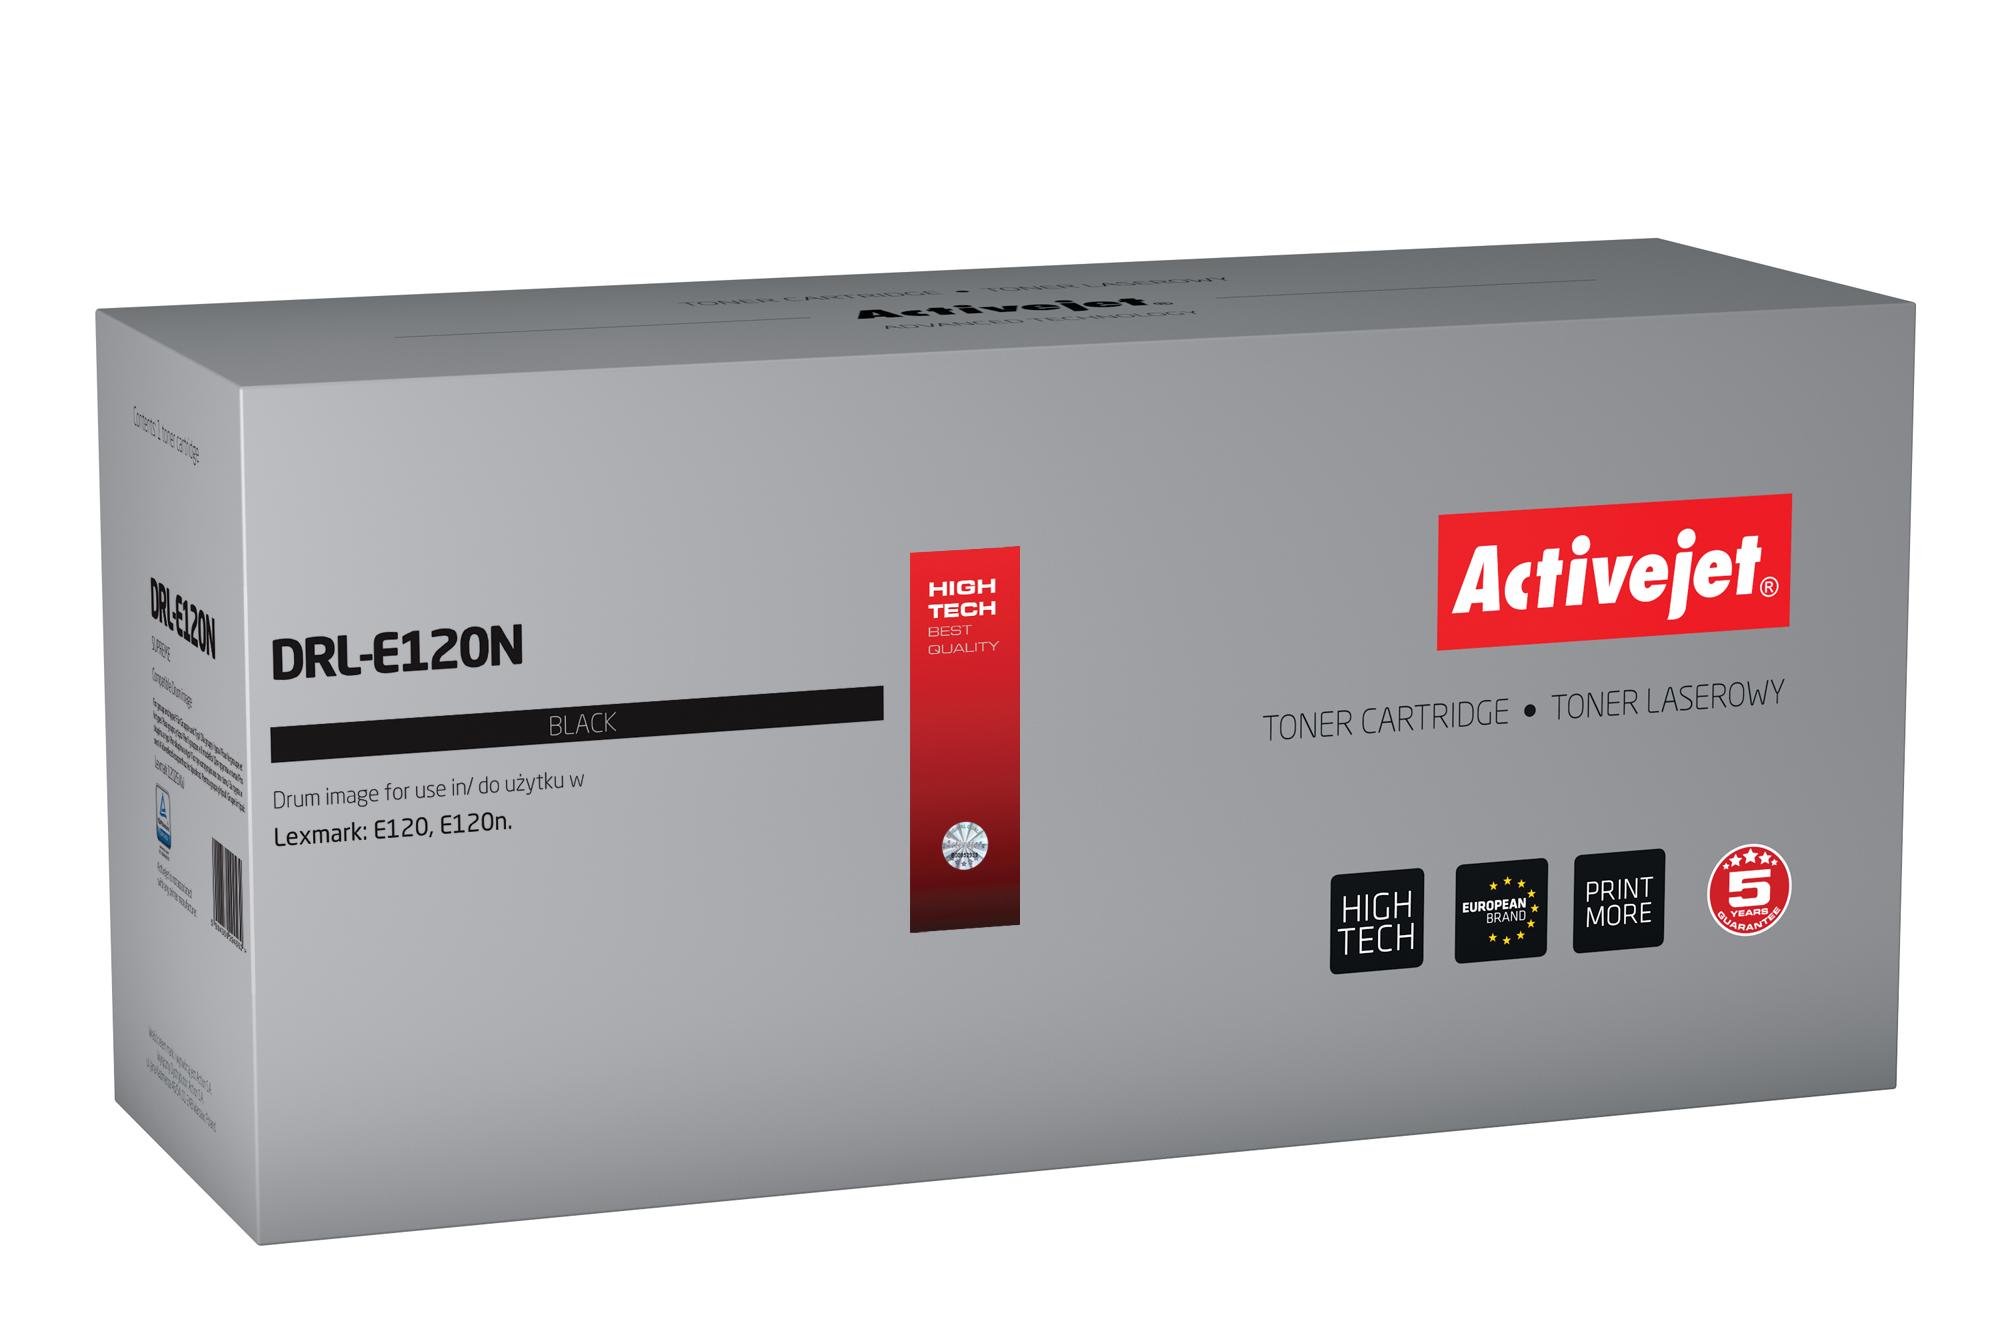 Bęben Activejet DRL-E120N do drukarki Lexmark, Zamiennik Lexmark 12026XW;  Supreme;  25000 stron;  czarny.